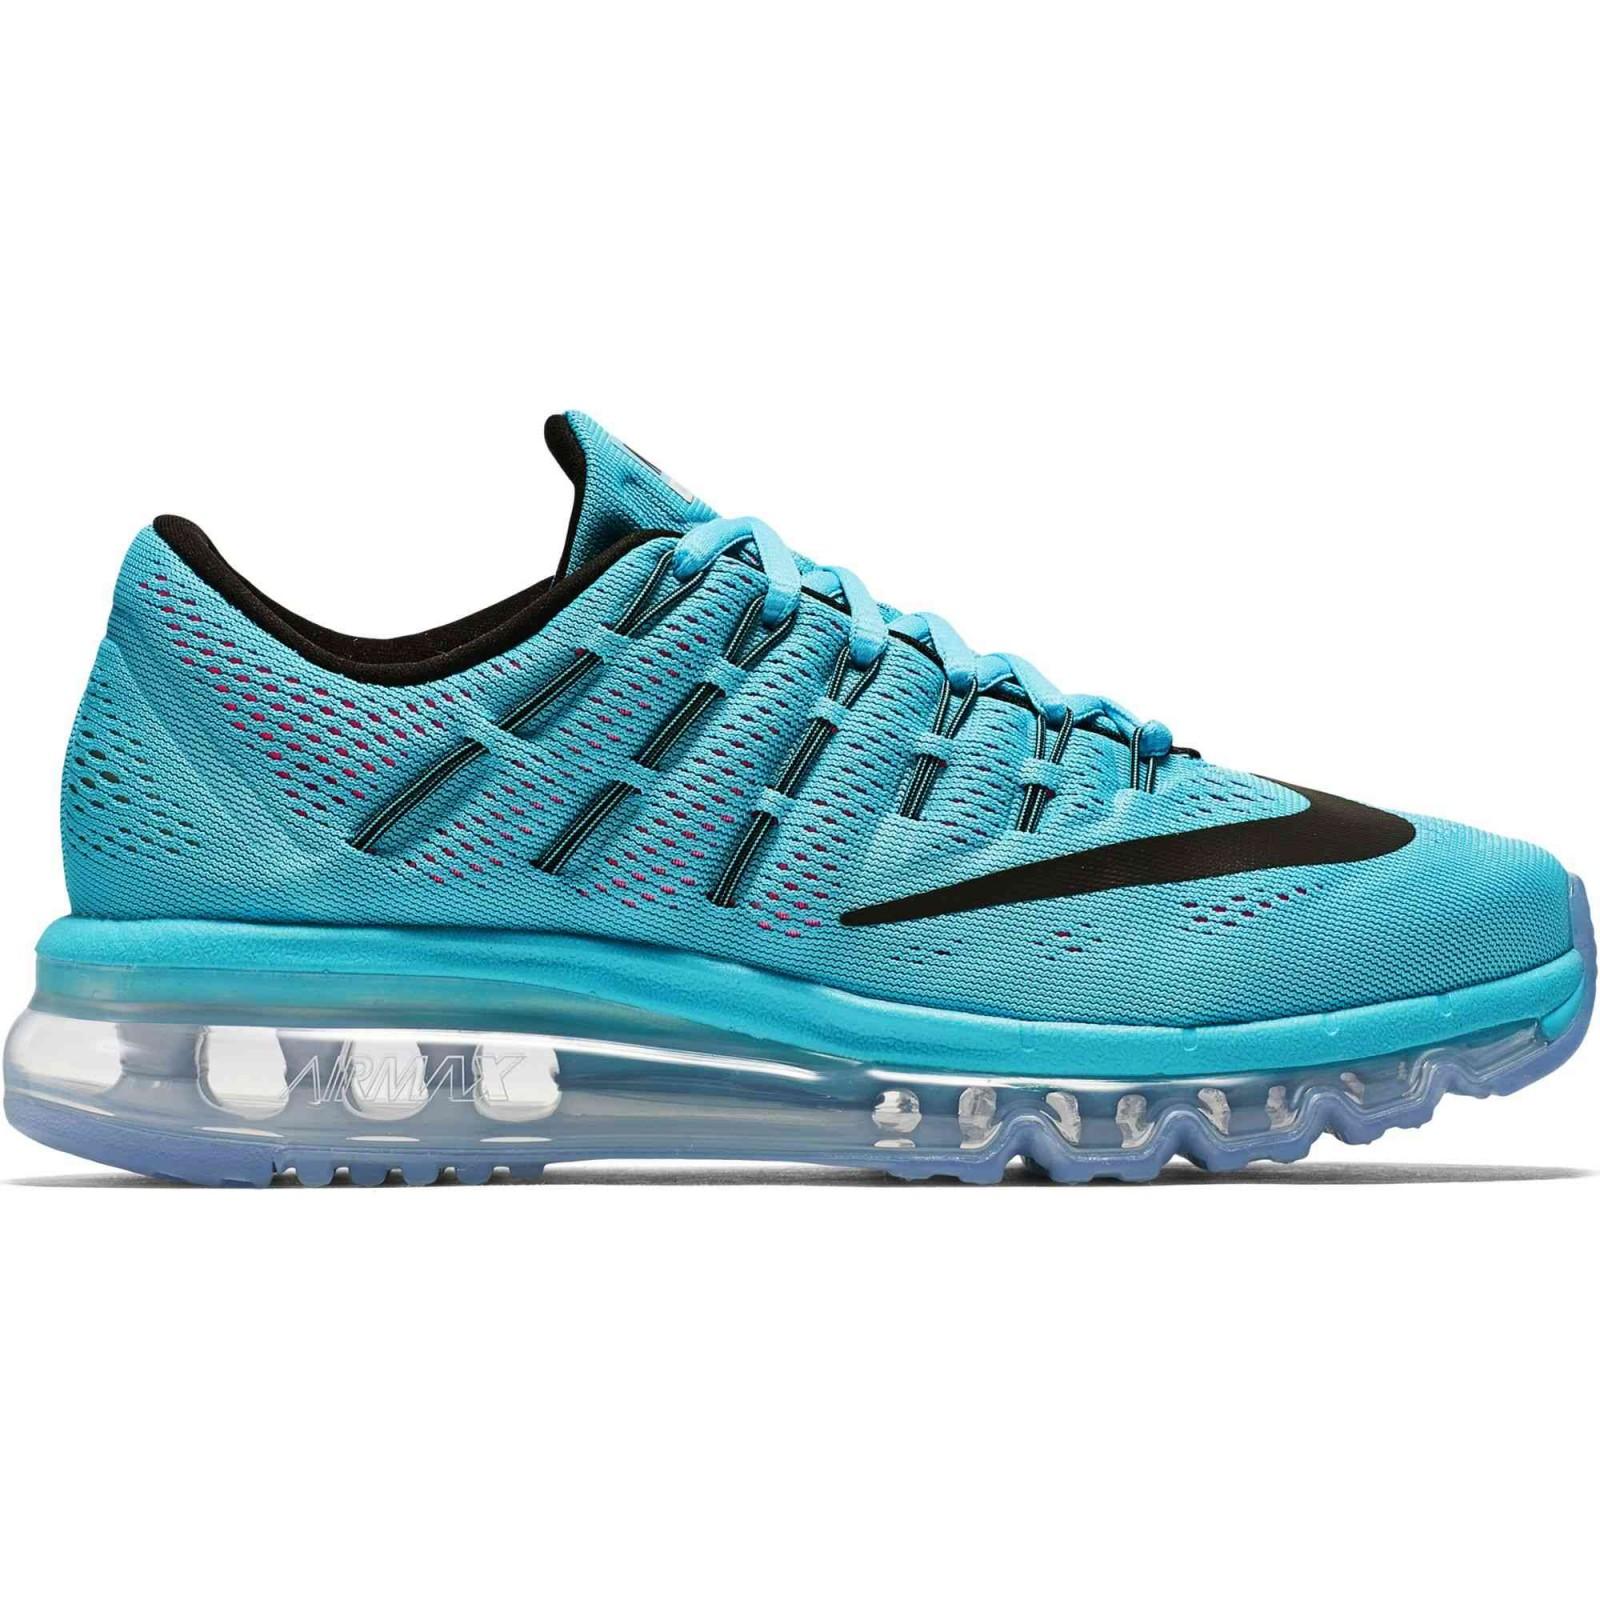 Dámské boty Nike WMNS AIR MAX 2016 tyrkysové  f55b64e4bd